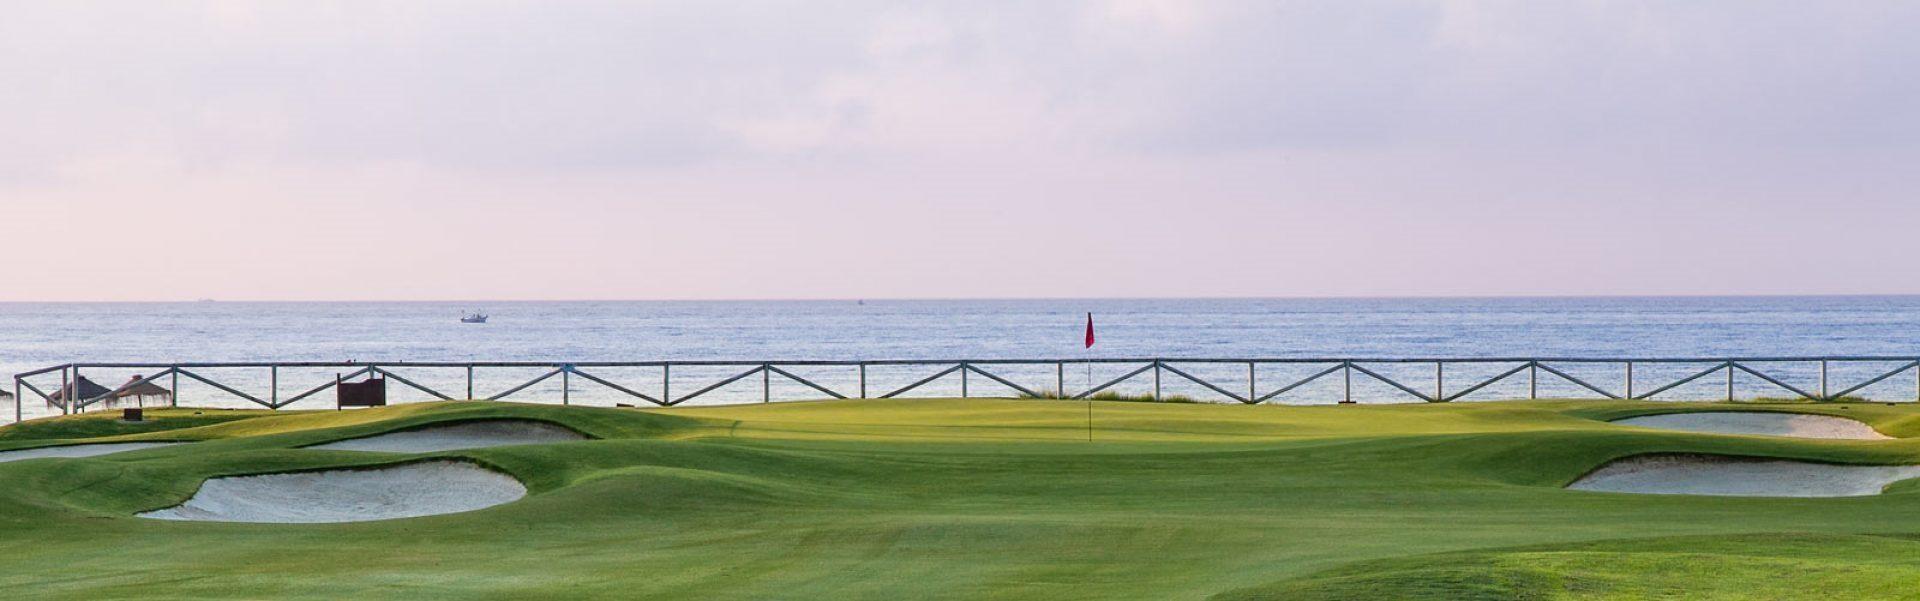 Golf apartments in Marbella - Marbella Unique Properties